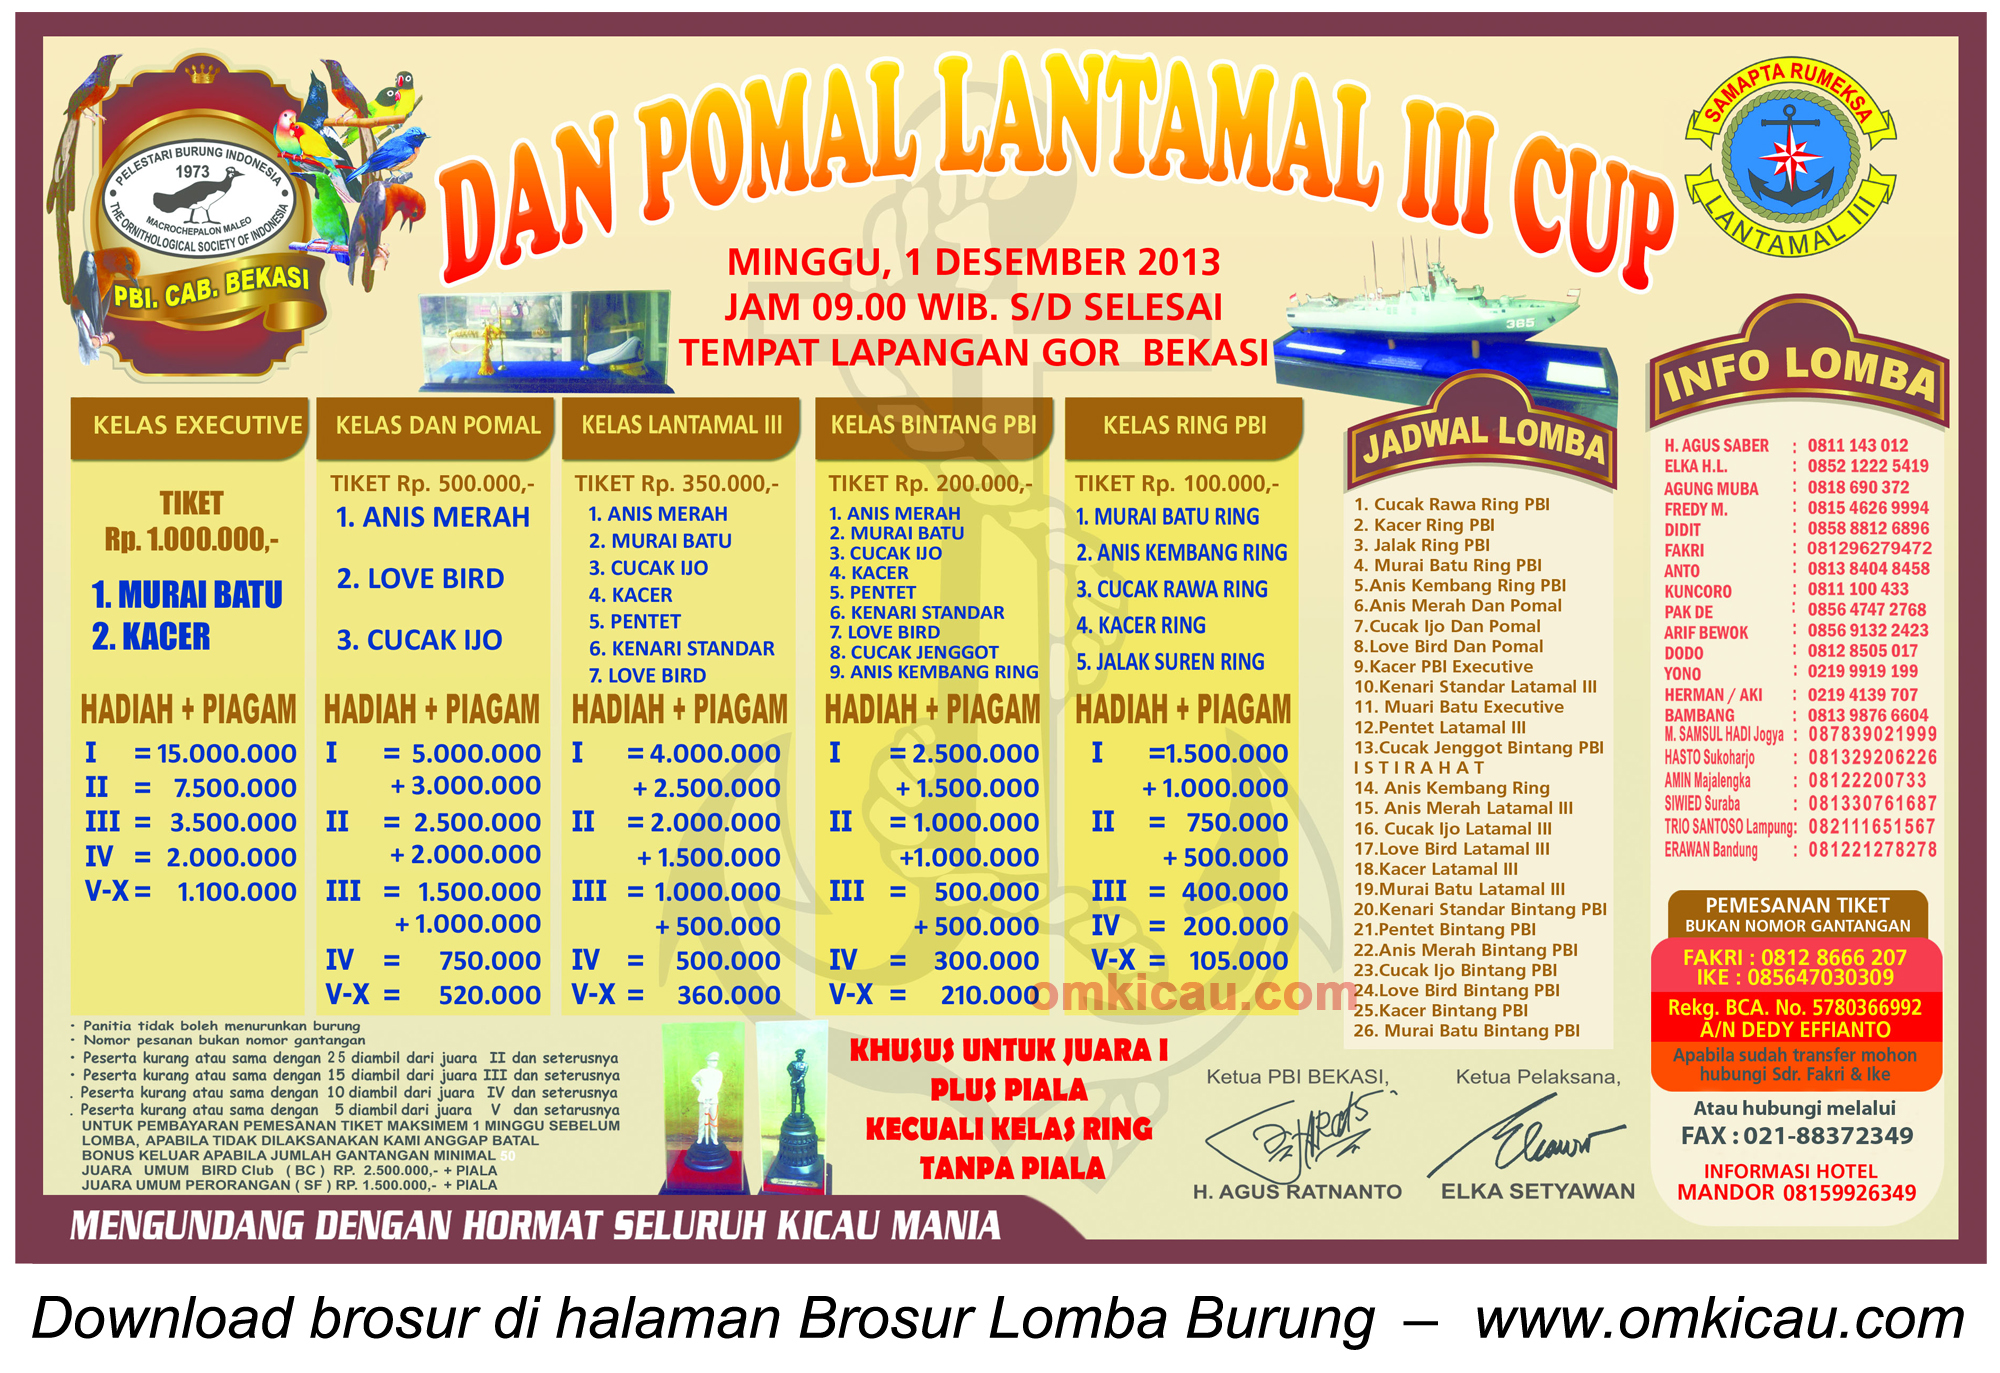 Brosur Lomba Burung Dan Pomal Lantamal III Cup, Bekasi, 1 Desember 2013